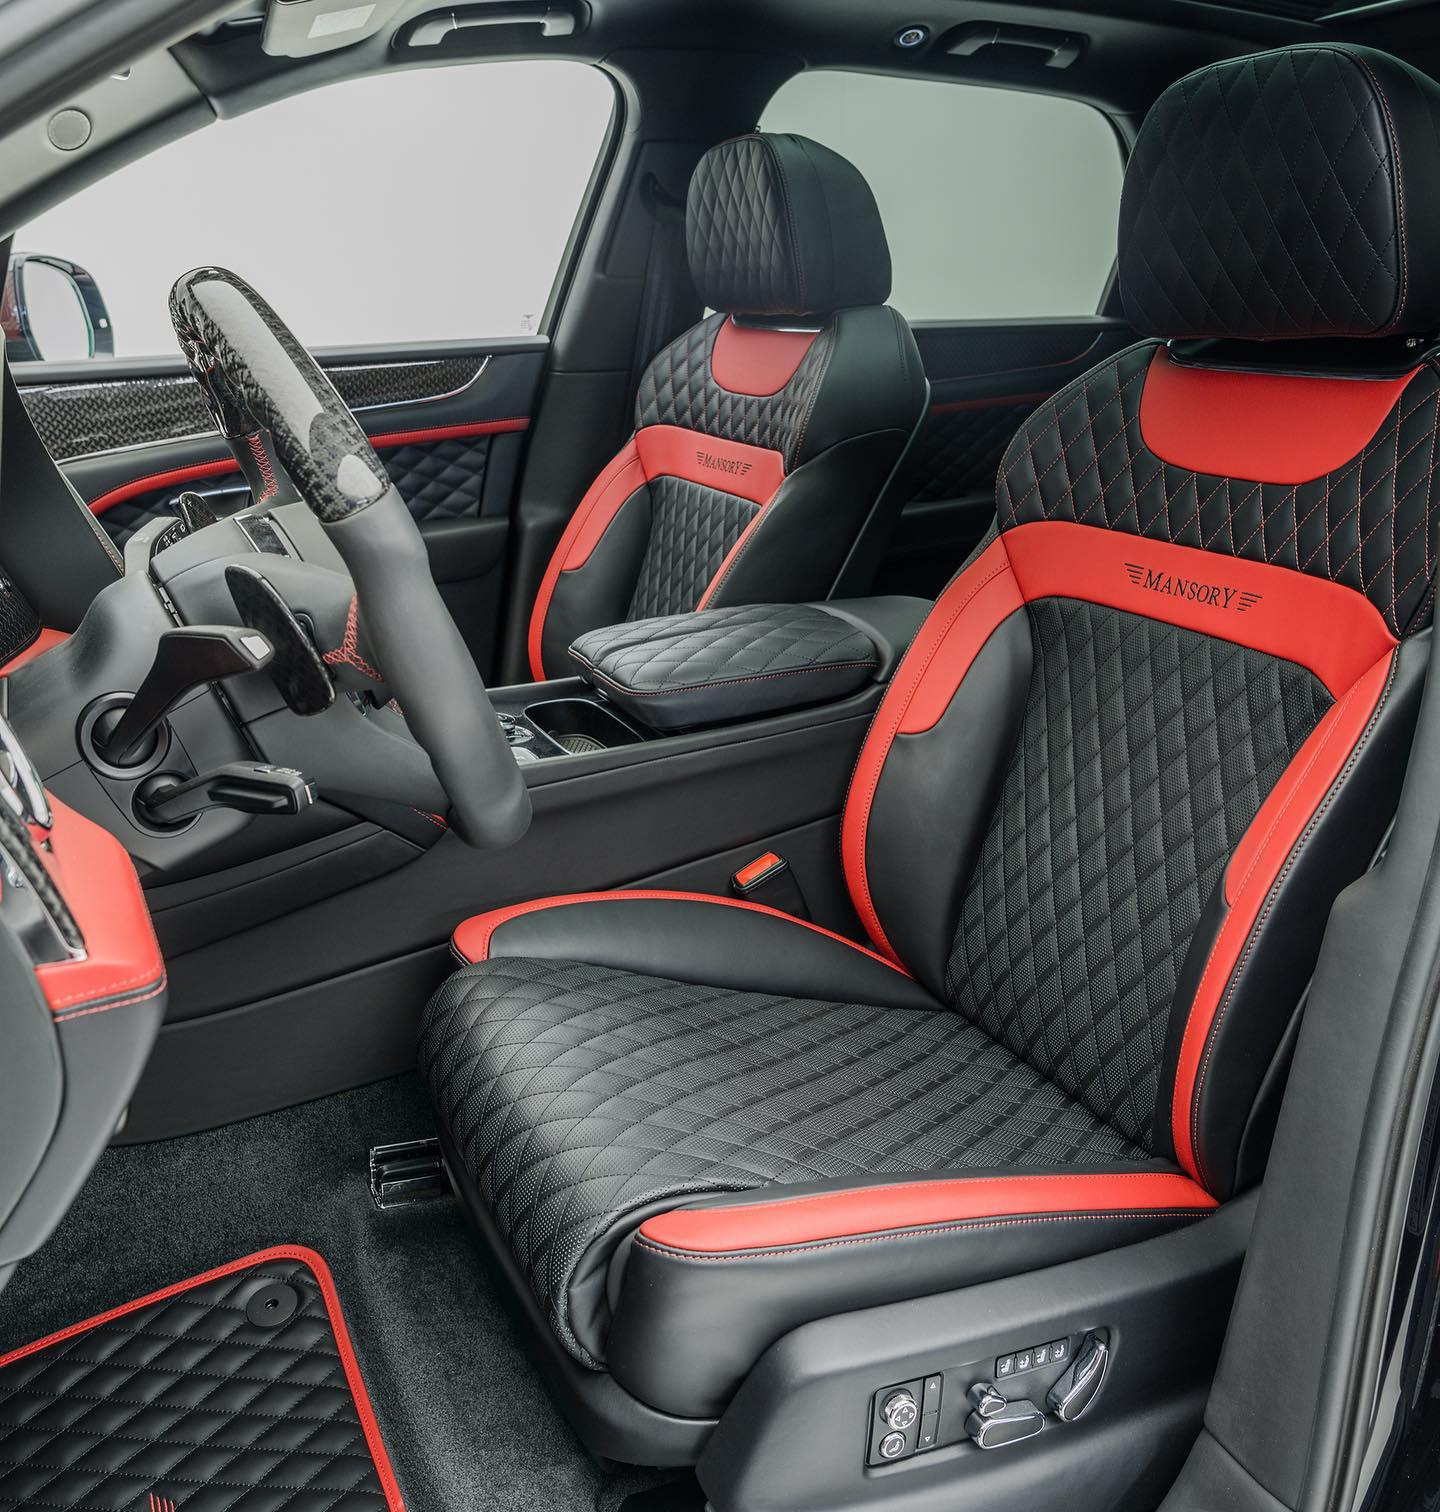 Bentley-Bentayga-Facelift-by-Mansory-12